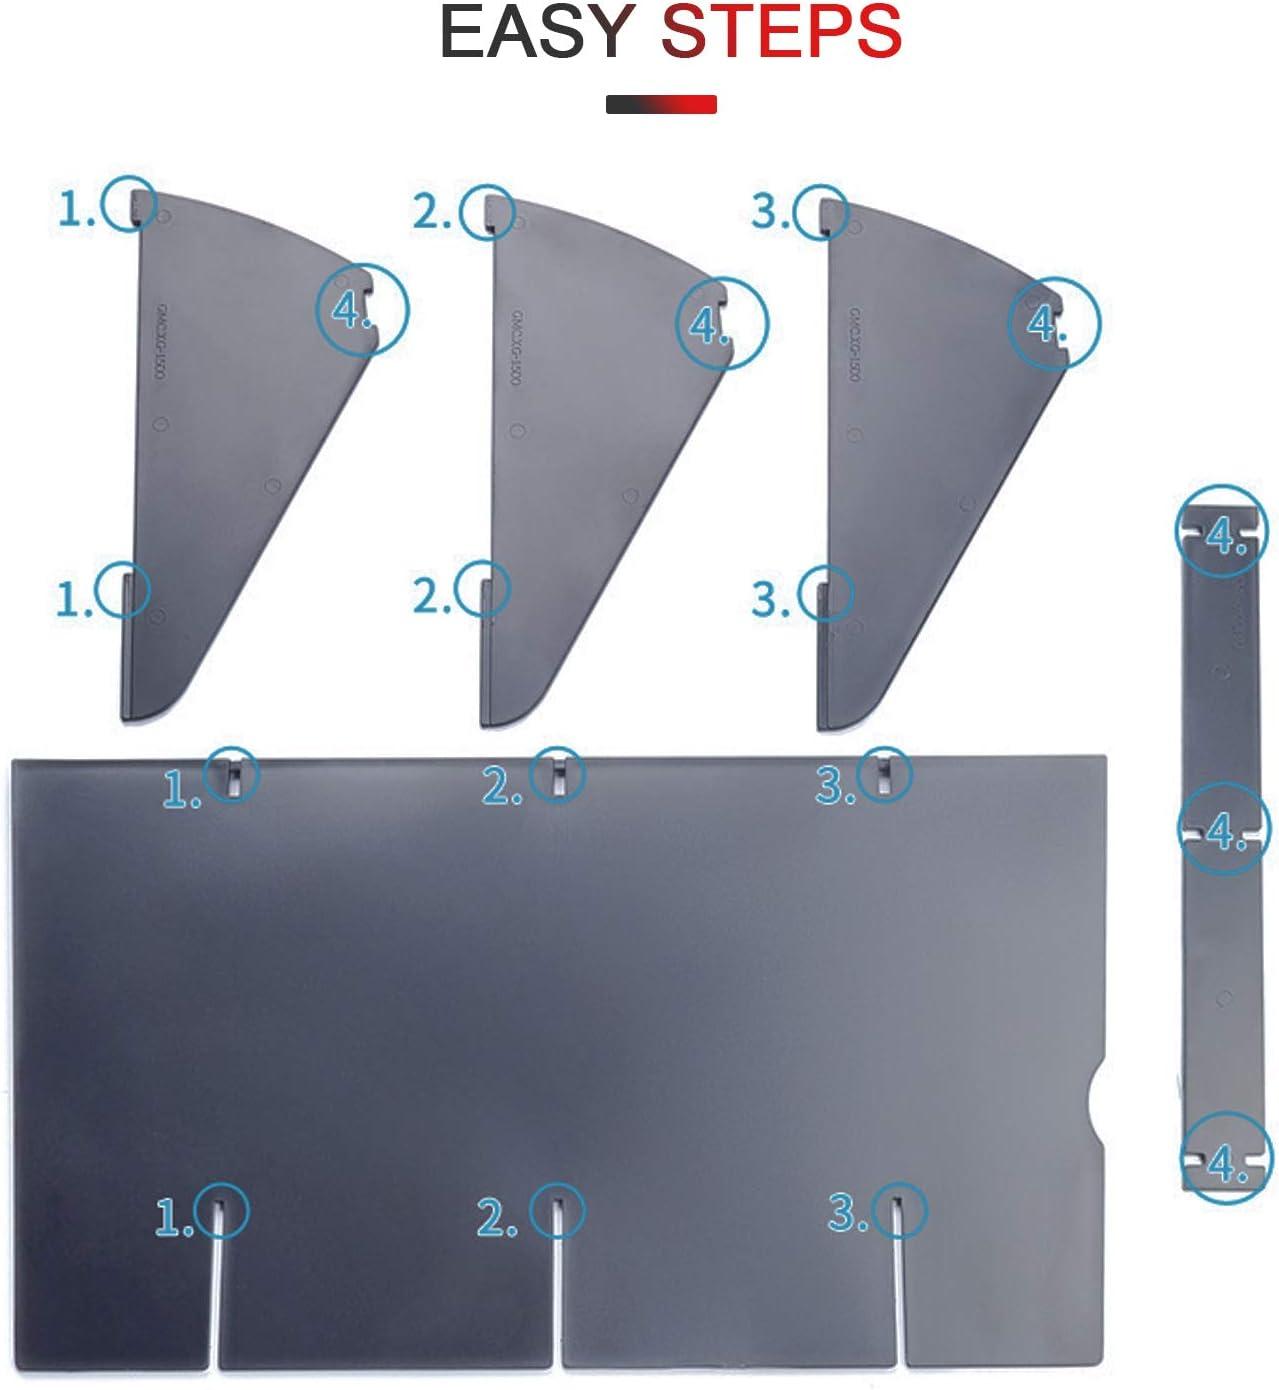 YEE PIN Glove Box Organizer Armrest Box Interval Storage Insert Divider Interior Accessories Fit for 2015 2016 2017 2018 2019 Chevy Colorado GMC Canyon Interior Accessories